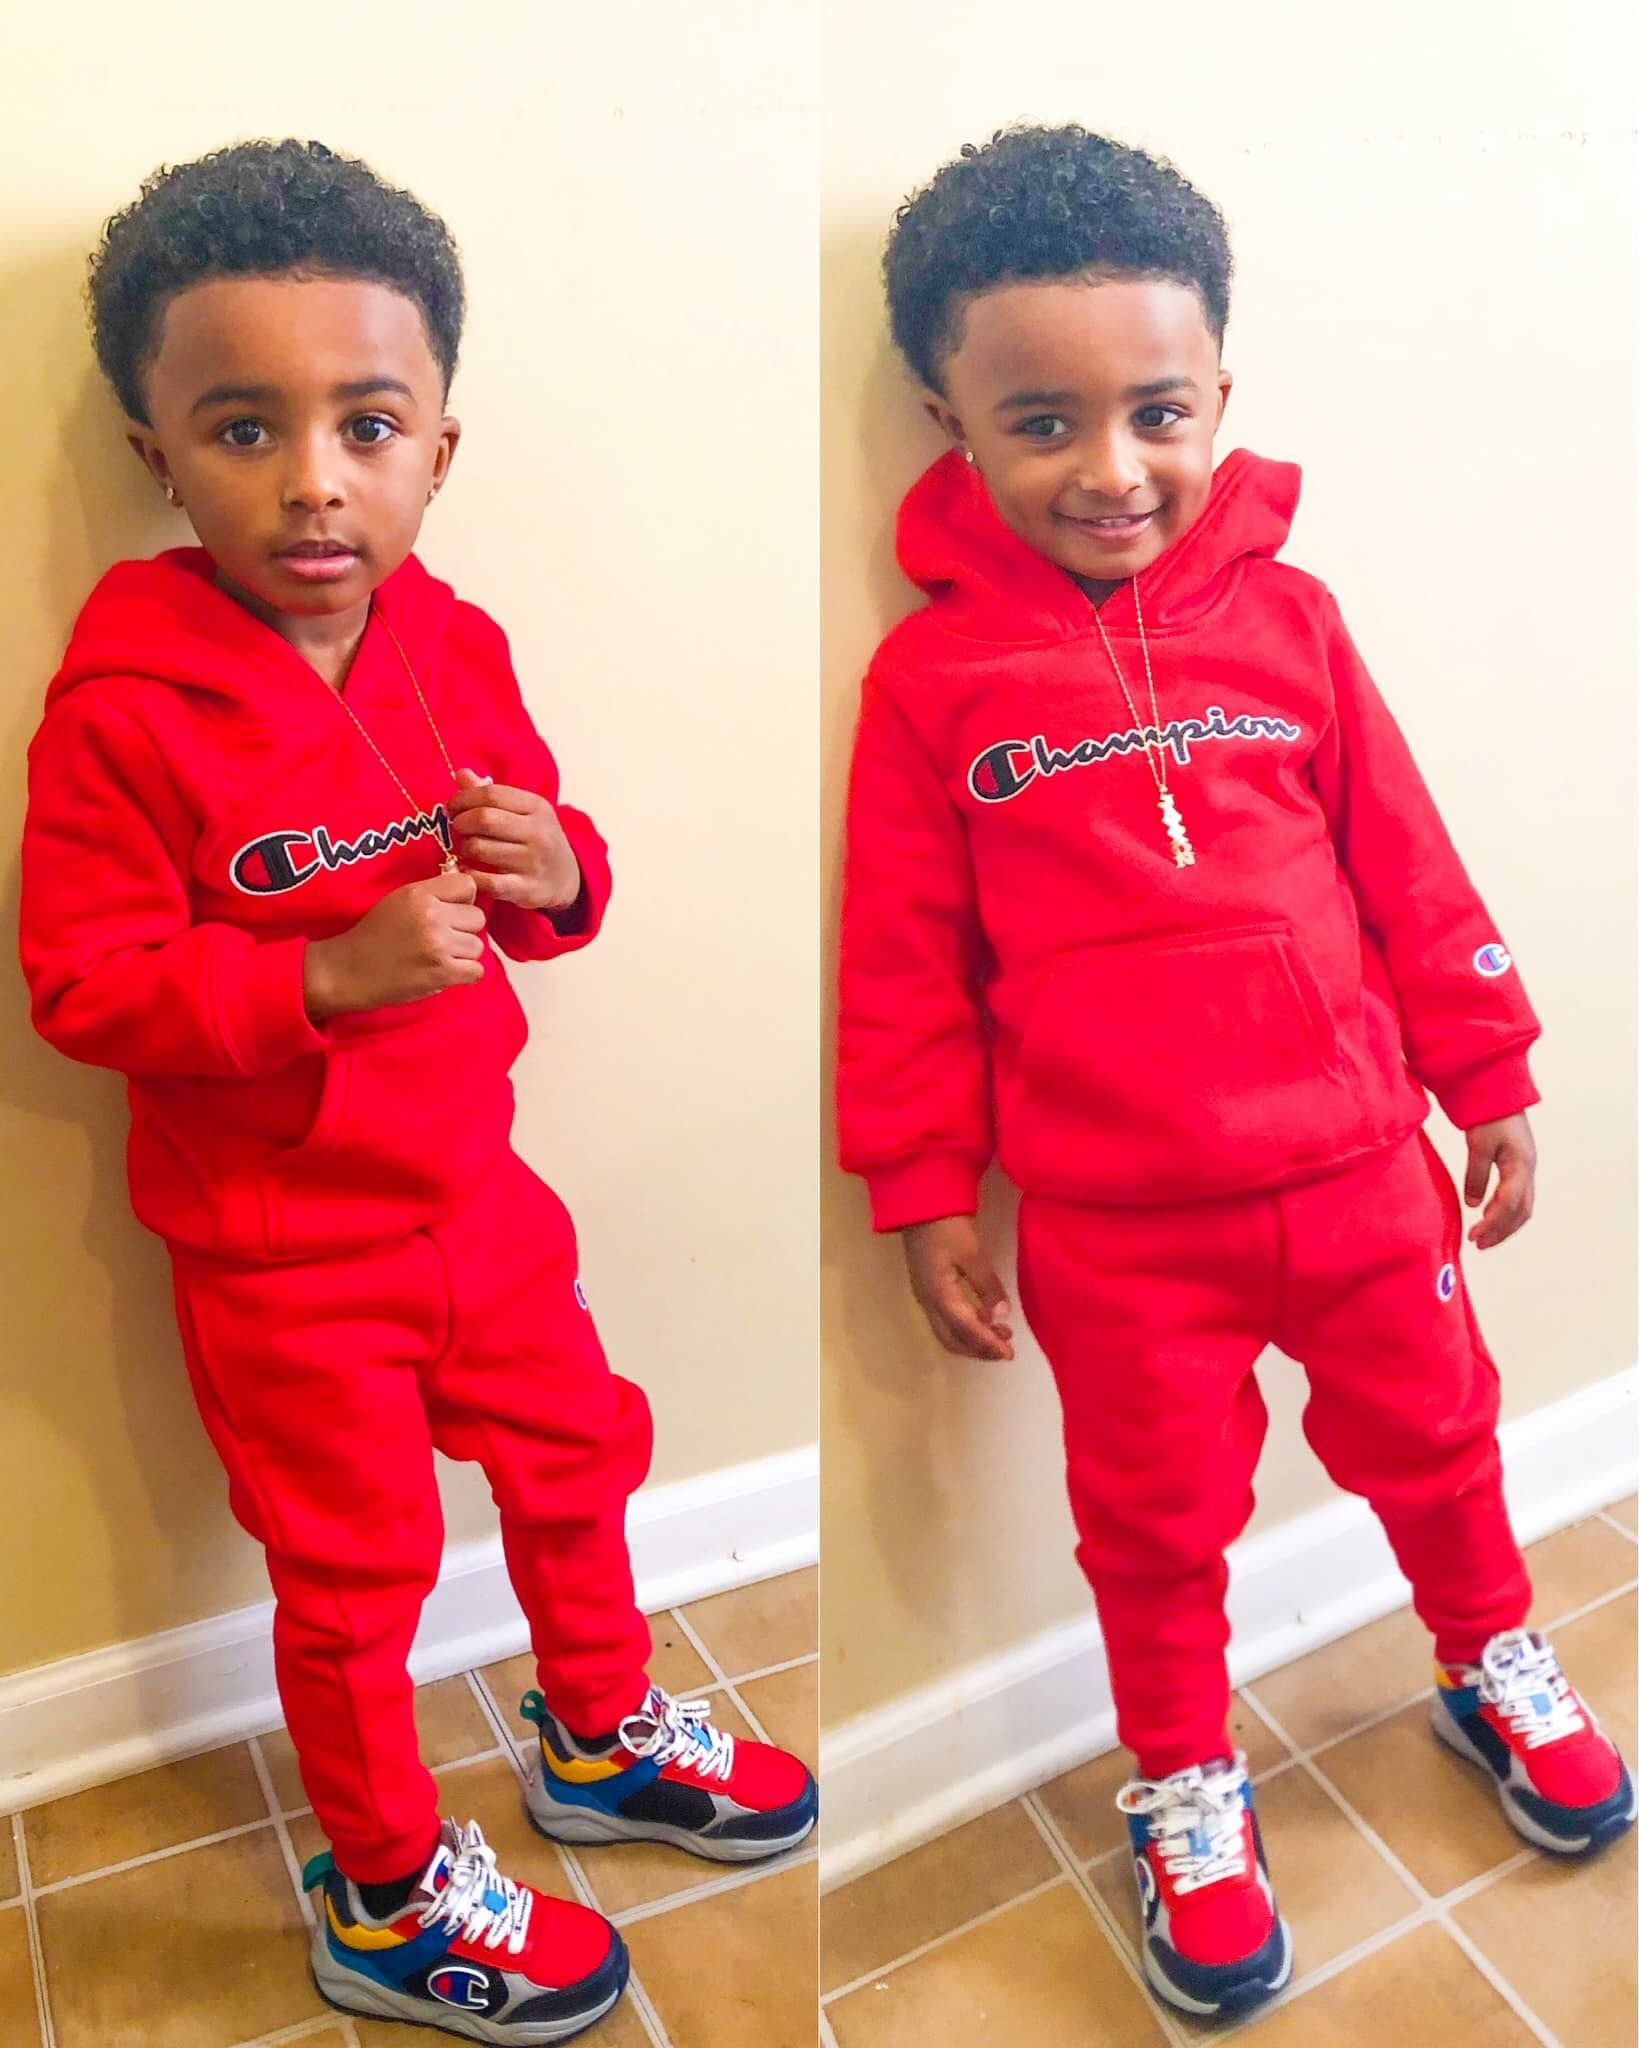 Pin by OkayTyra on Youngin's | Cute black baby boys ...